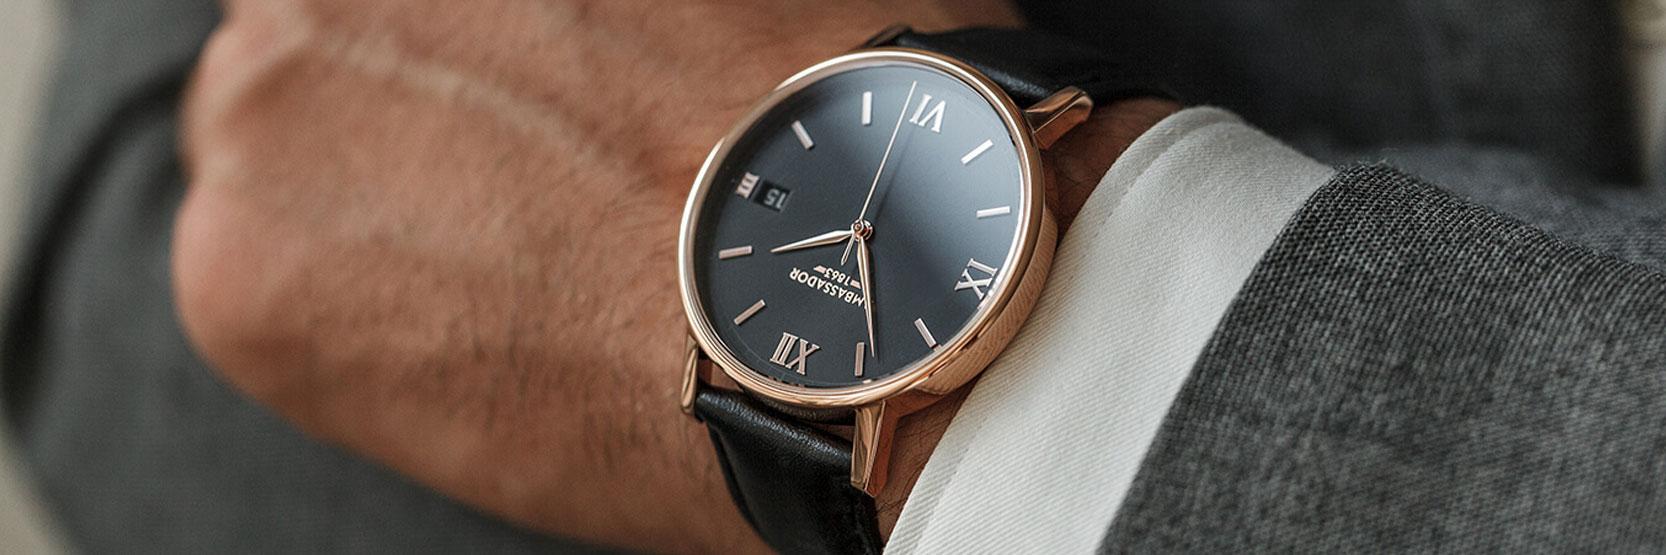 4439c41f5 السر وراء ارتداء الساعة في اليد اليسرى